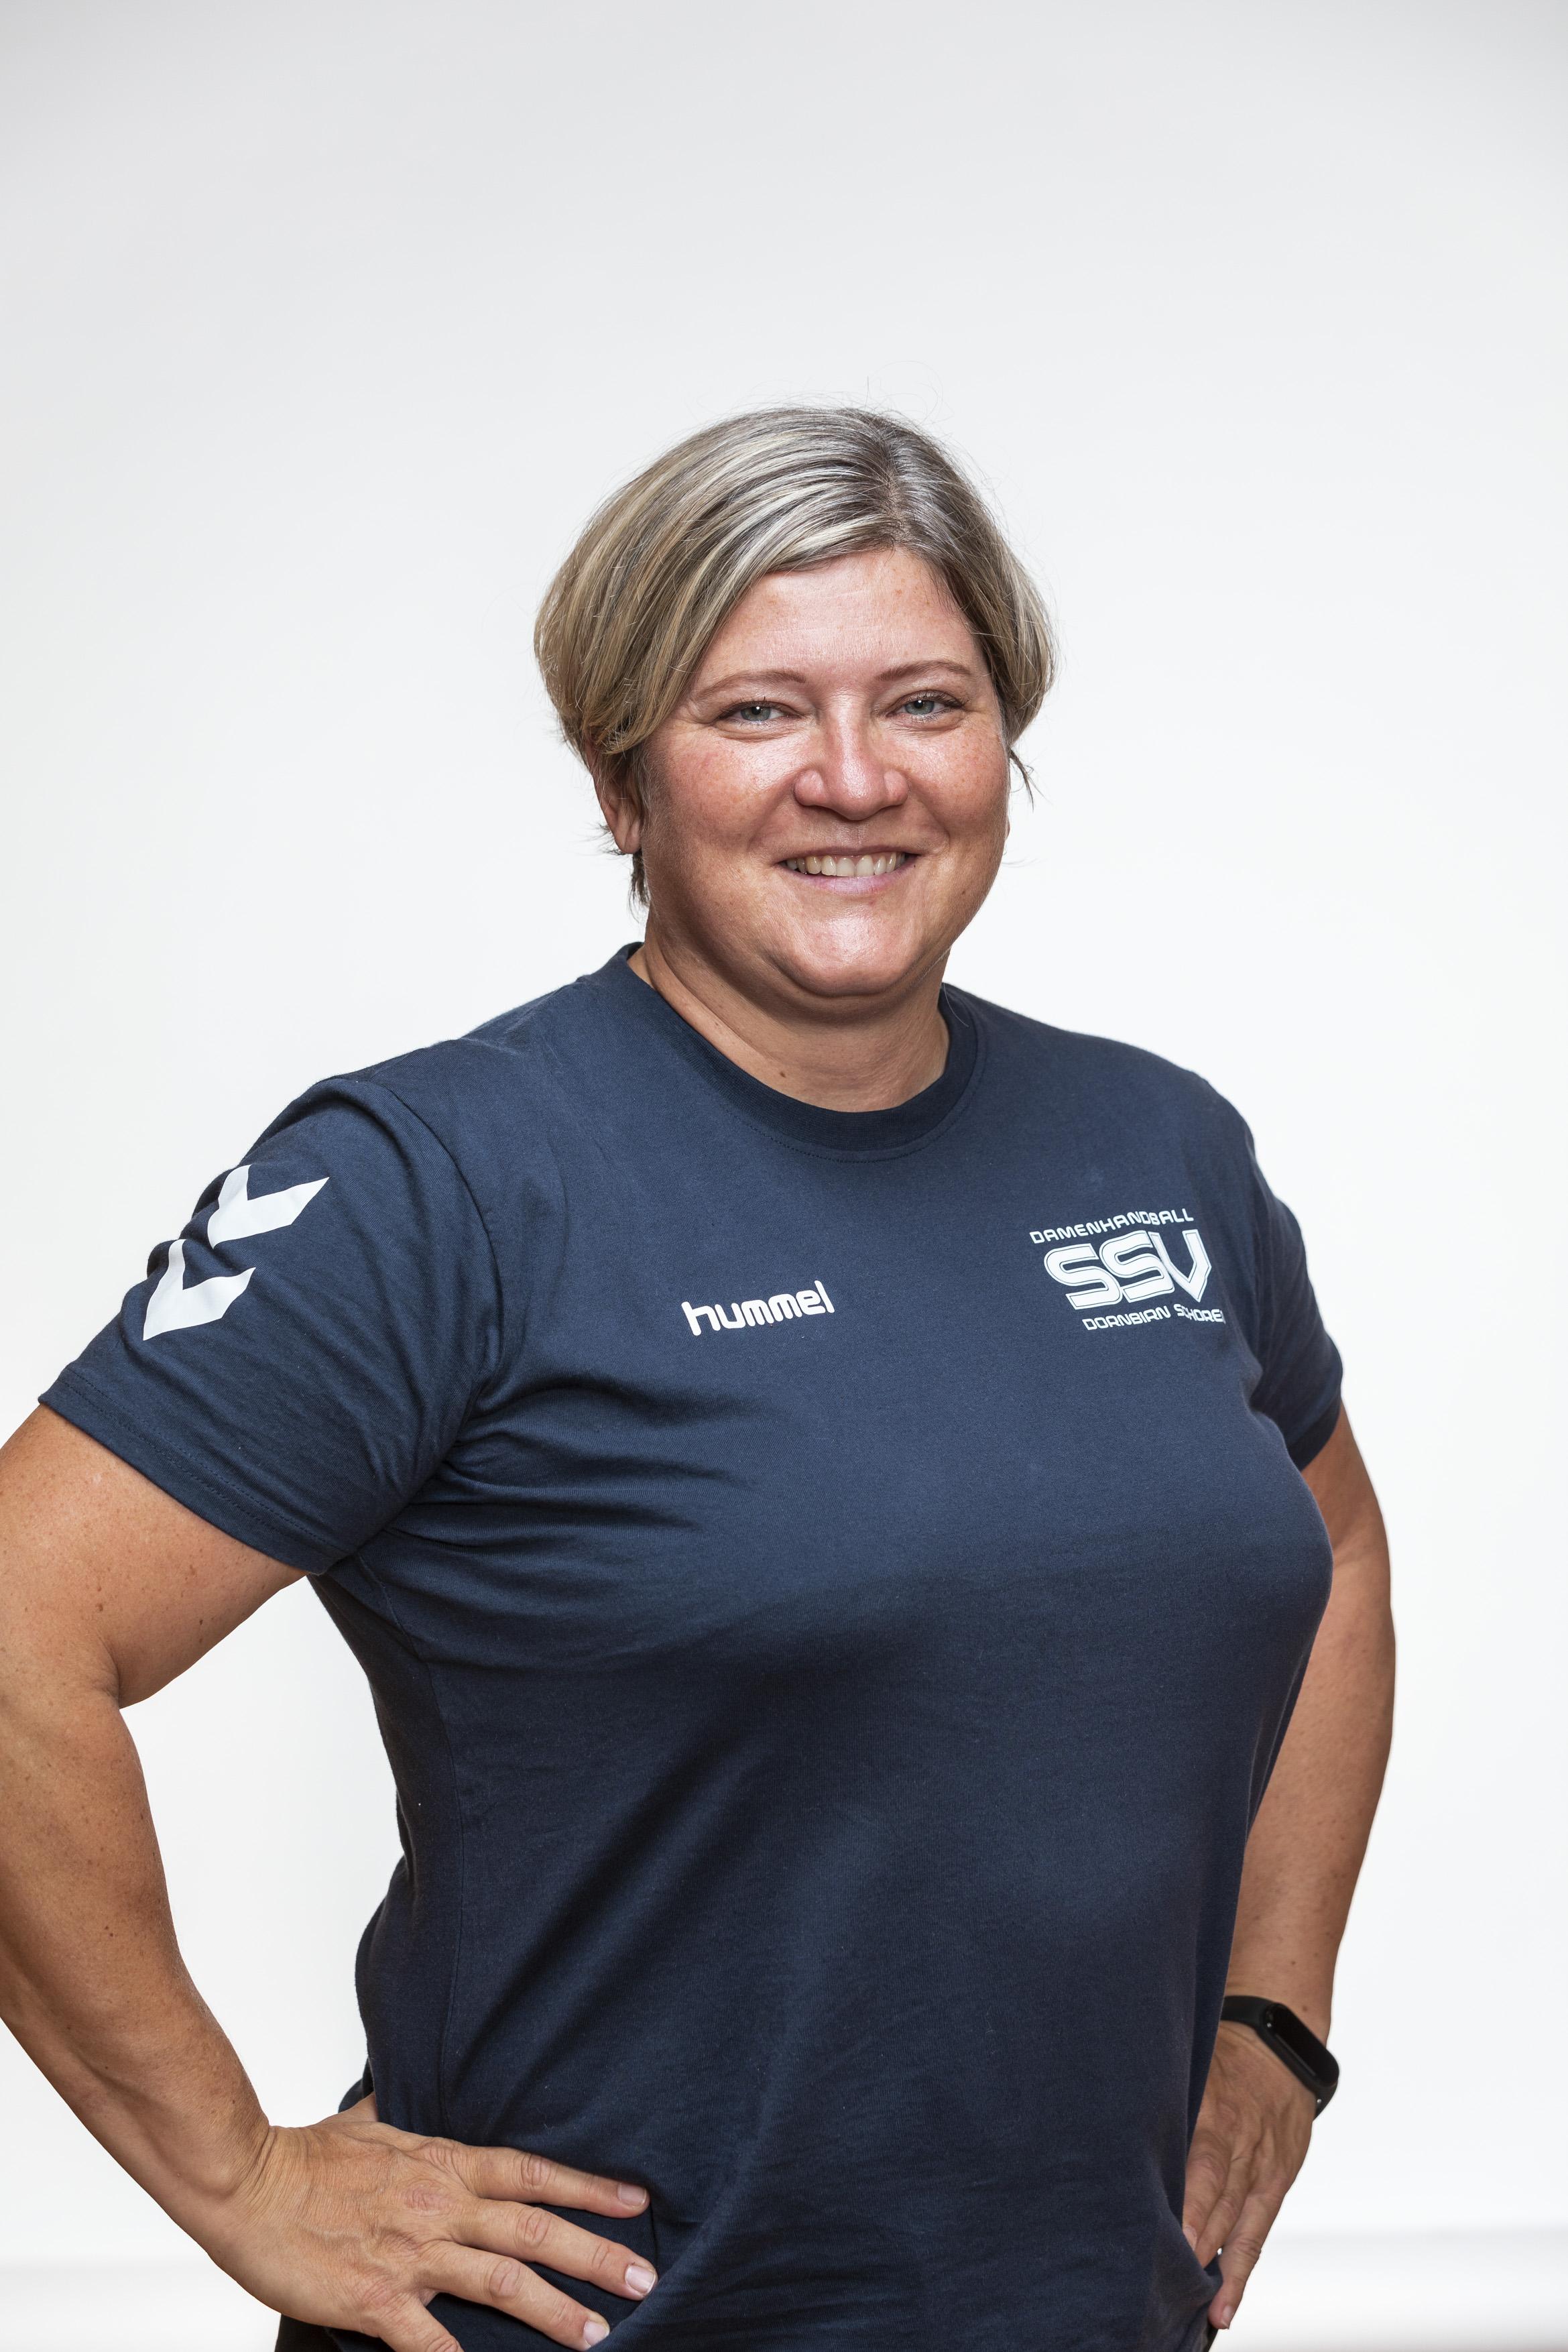 Sabine Petzak